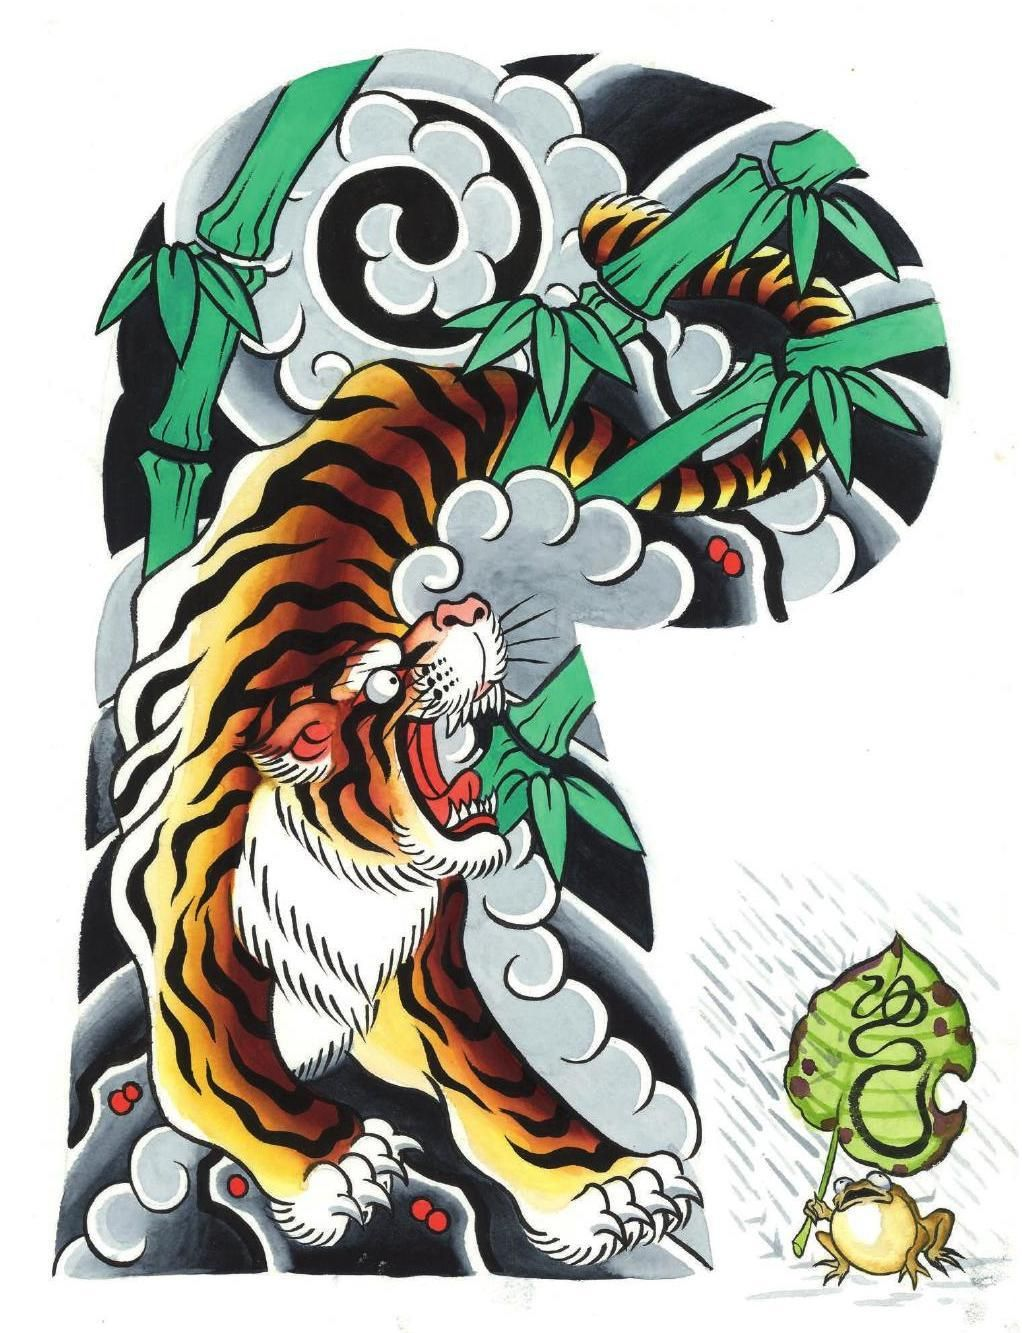 Tattoo Flash Book Garyou Tensei 108 Japanese Tattoo Sleeve Designs By Yushi Horiki Japanische Schriftzeichen Tattoos Krake Tattoo Design Armeltatowierungen